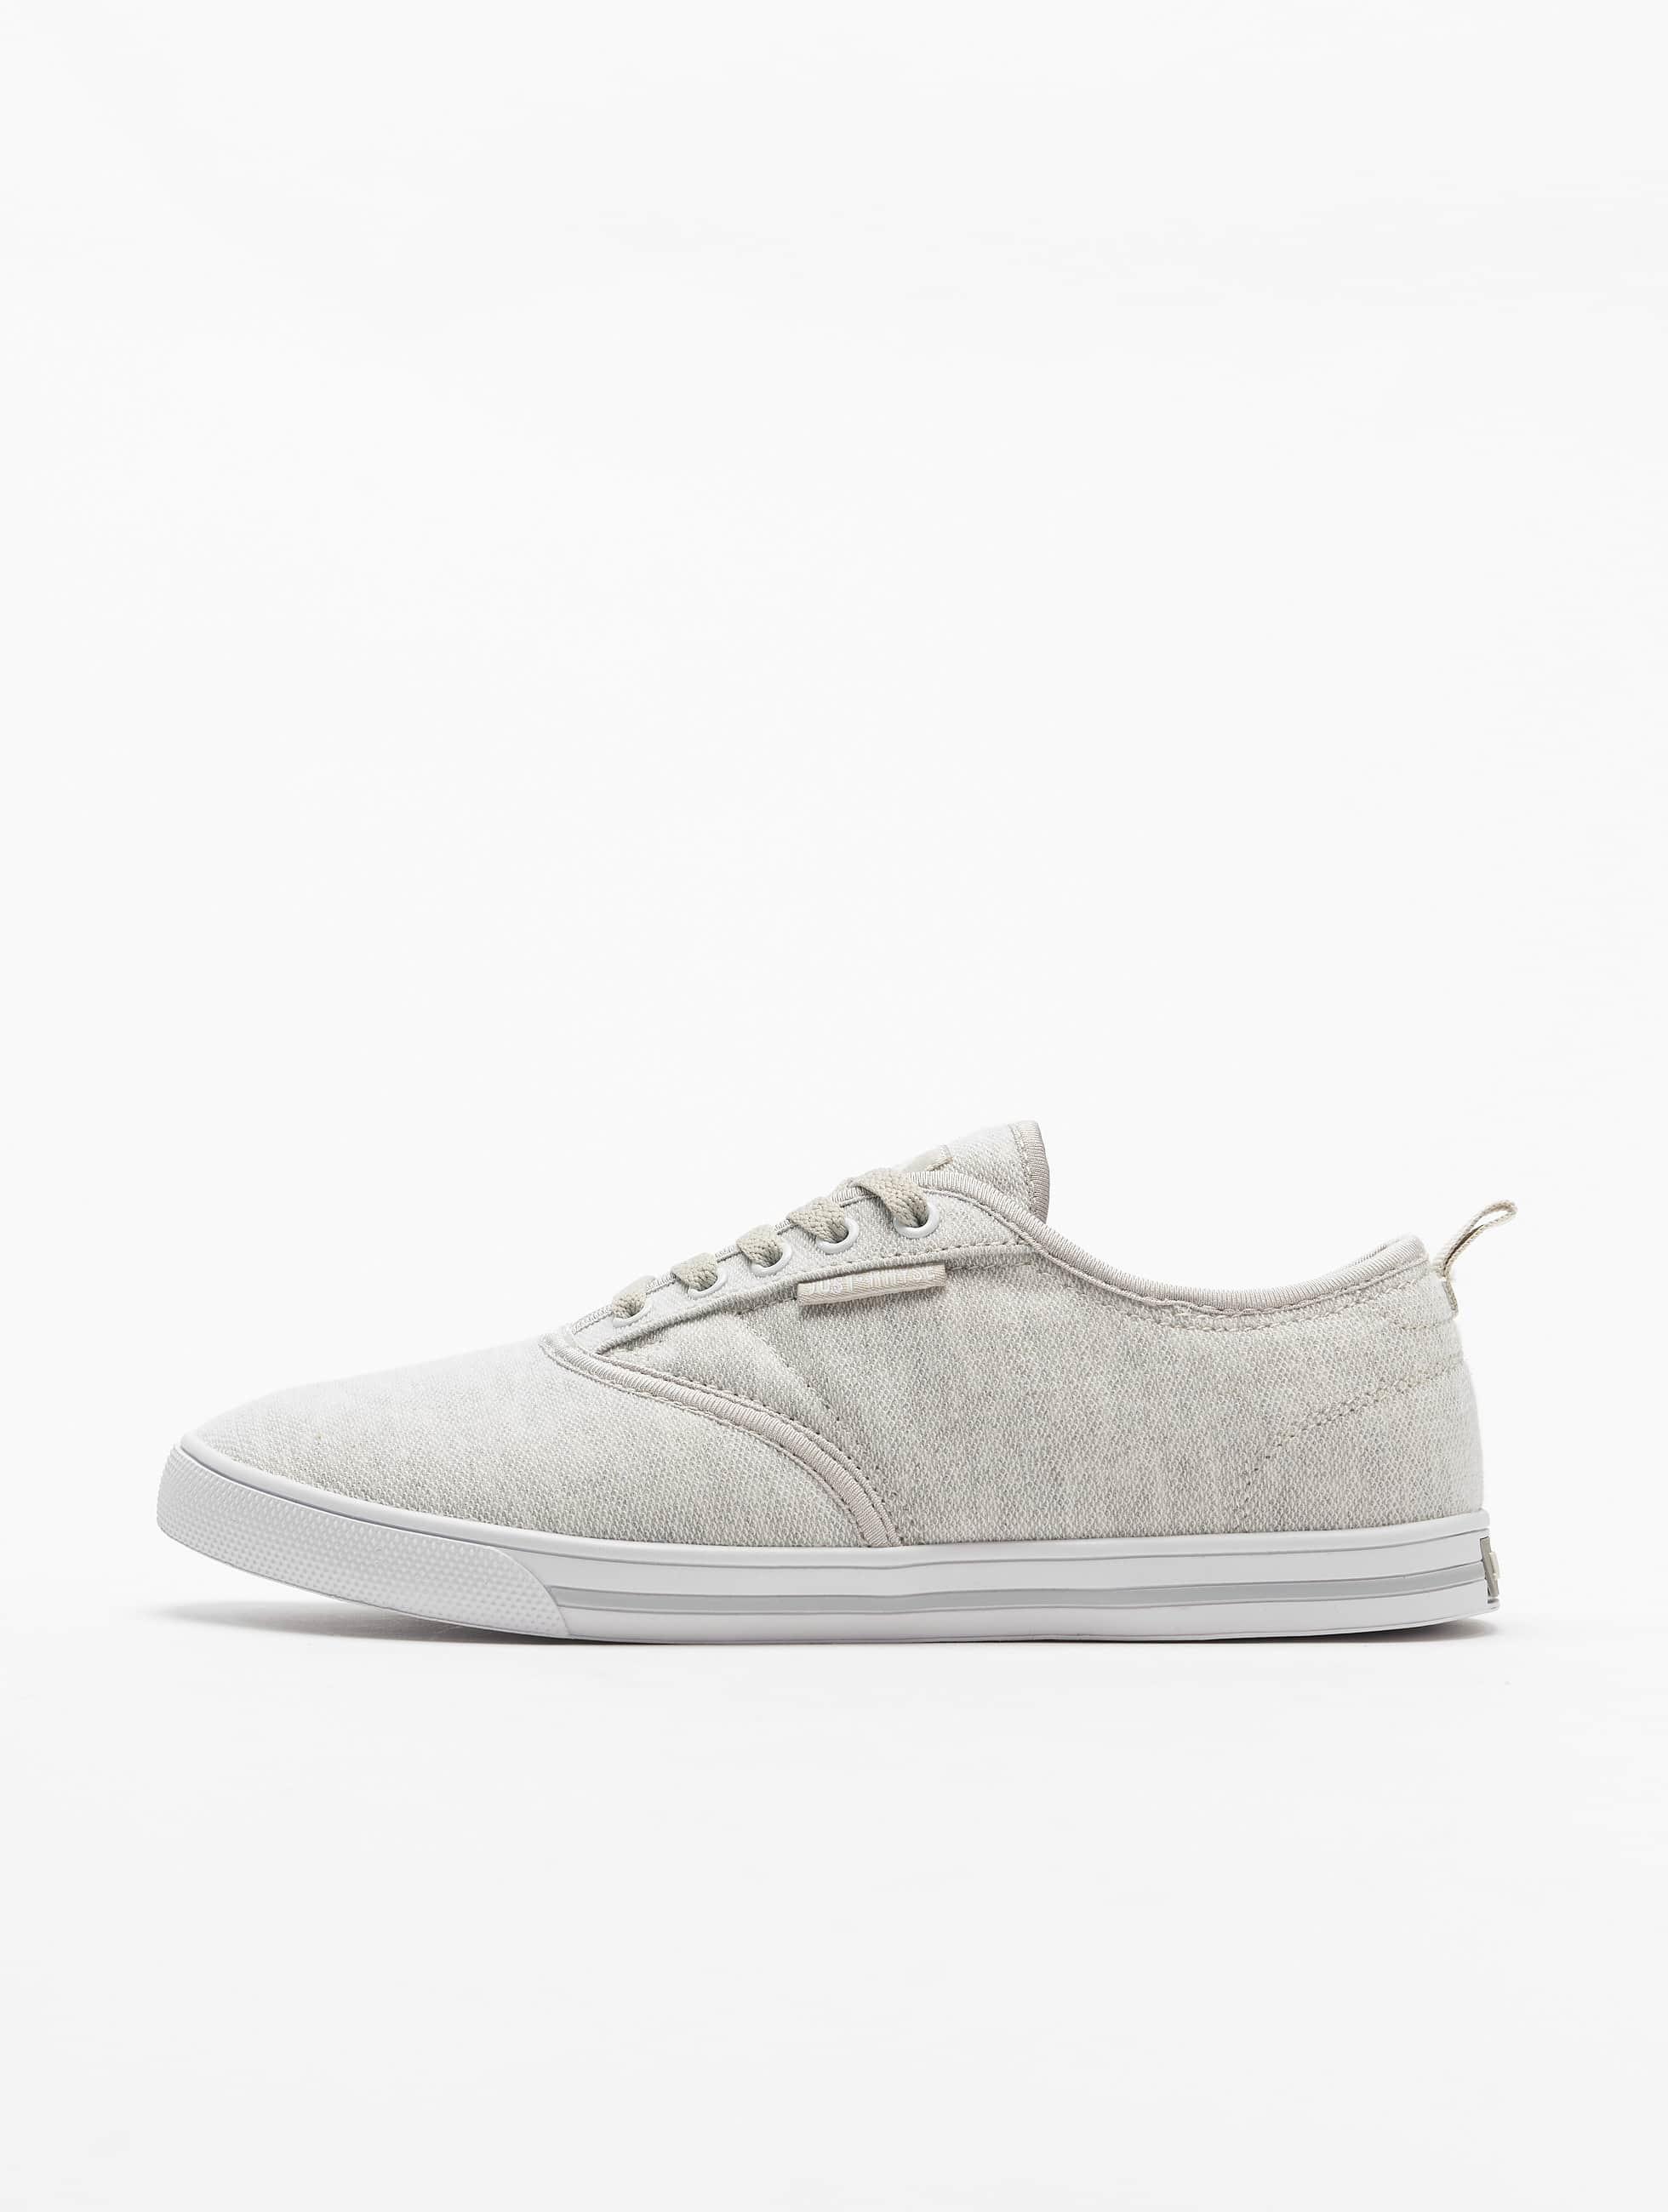 Just Rhyse / Sneakers Stay True in grey 46